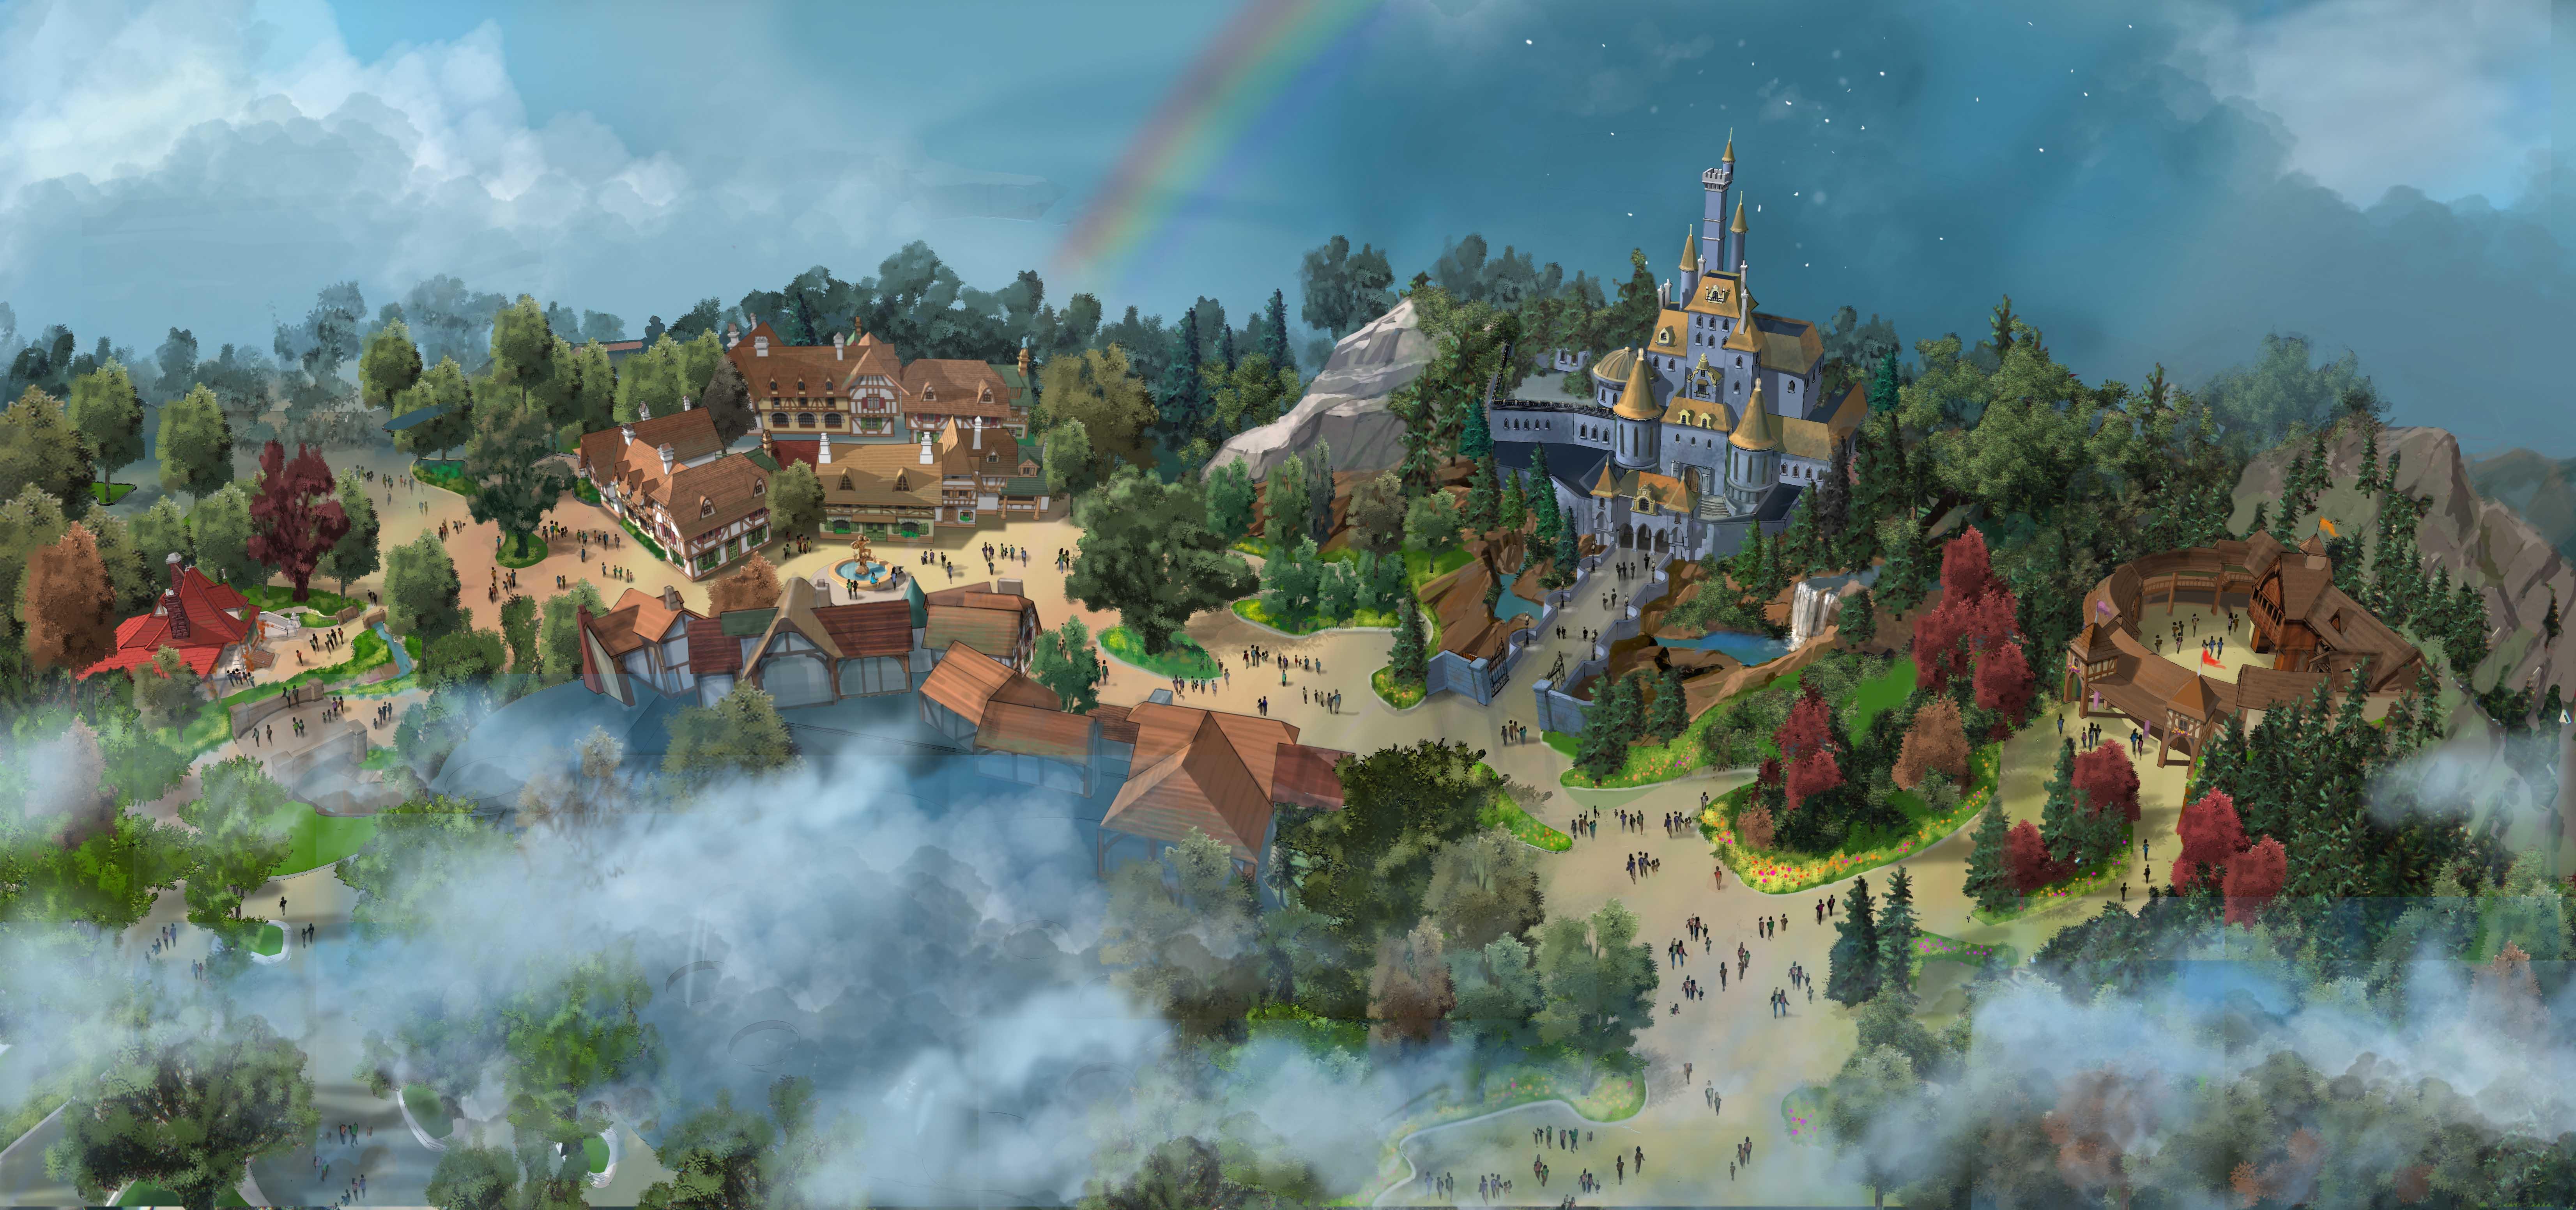 Tokyo Disneyland and Tokyo DisneySea Development Plans Announced